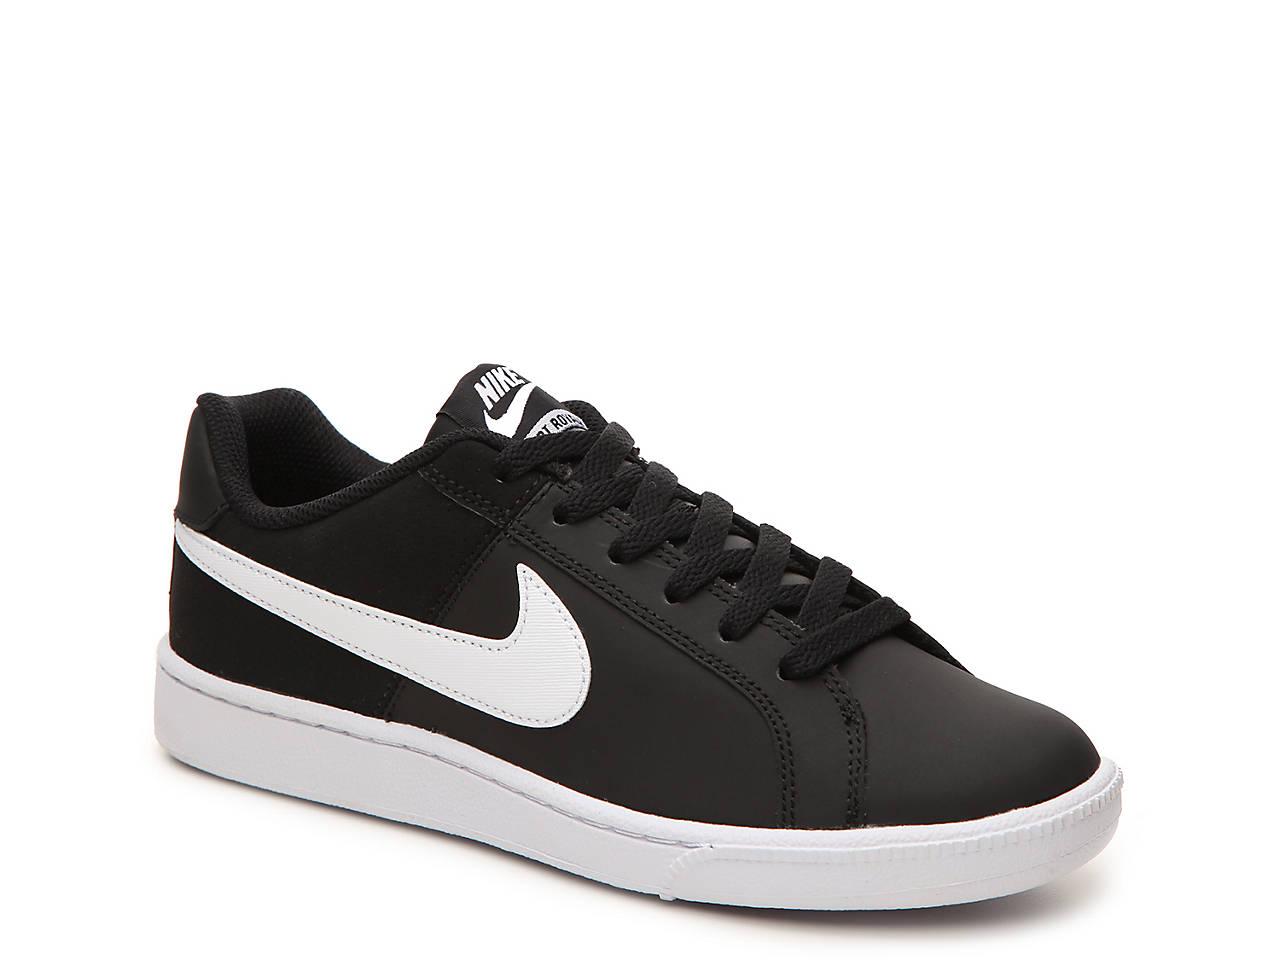 Nike Court Royale Sneaker - Women s Women s Shoes   DSW 566e11ab0cb0